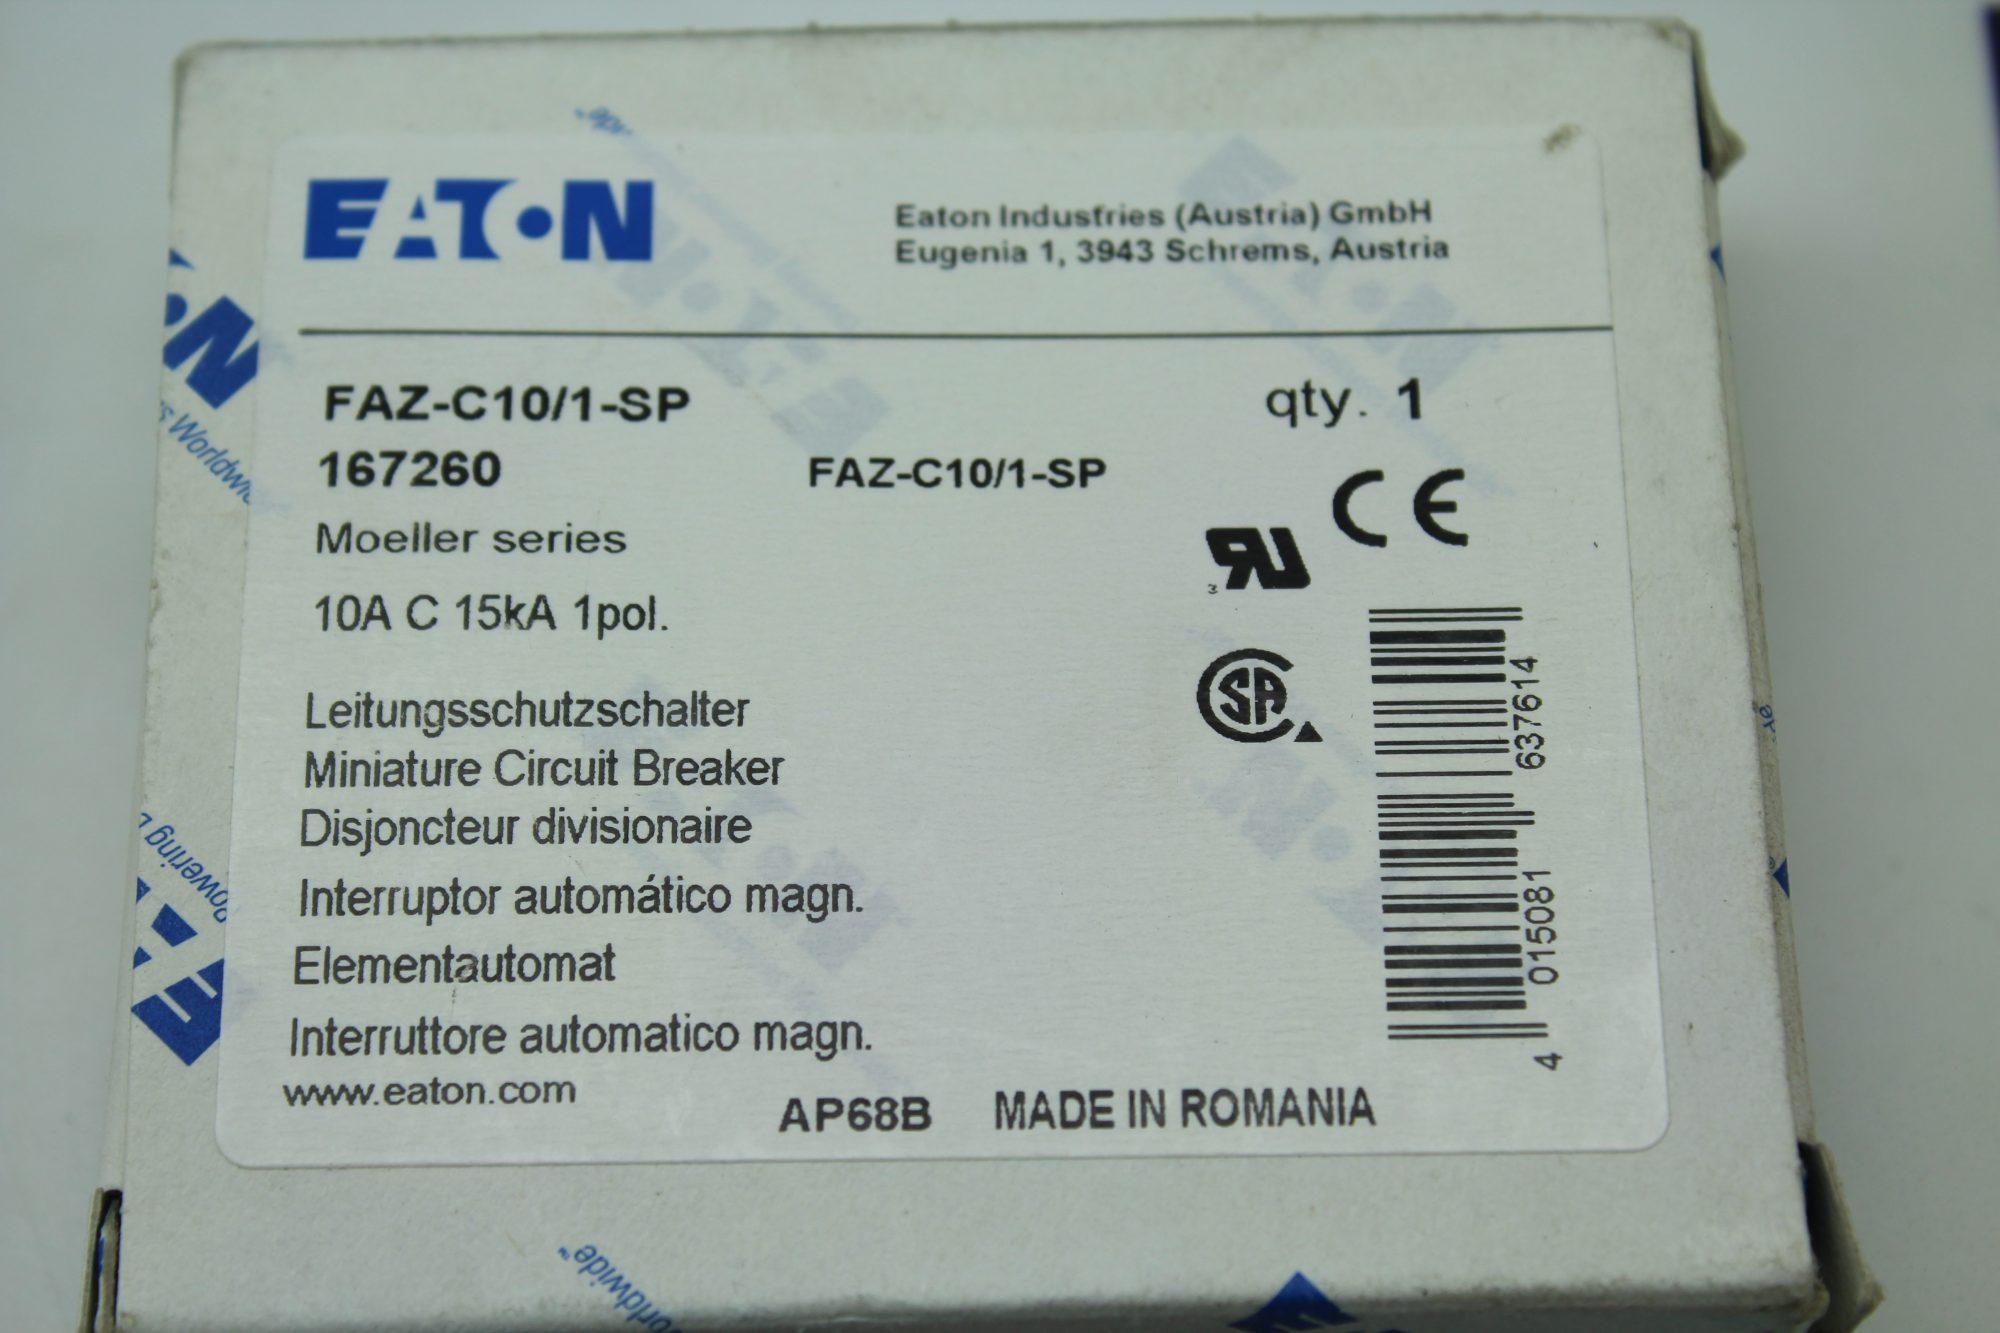 Eaton Faz C10 1 Sp Moeller Series Circuit Breaker Miniature Breakers